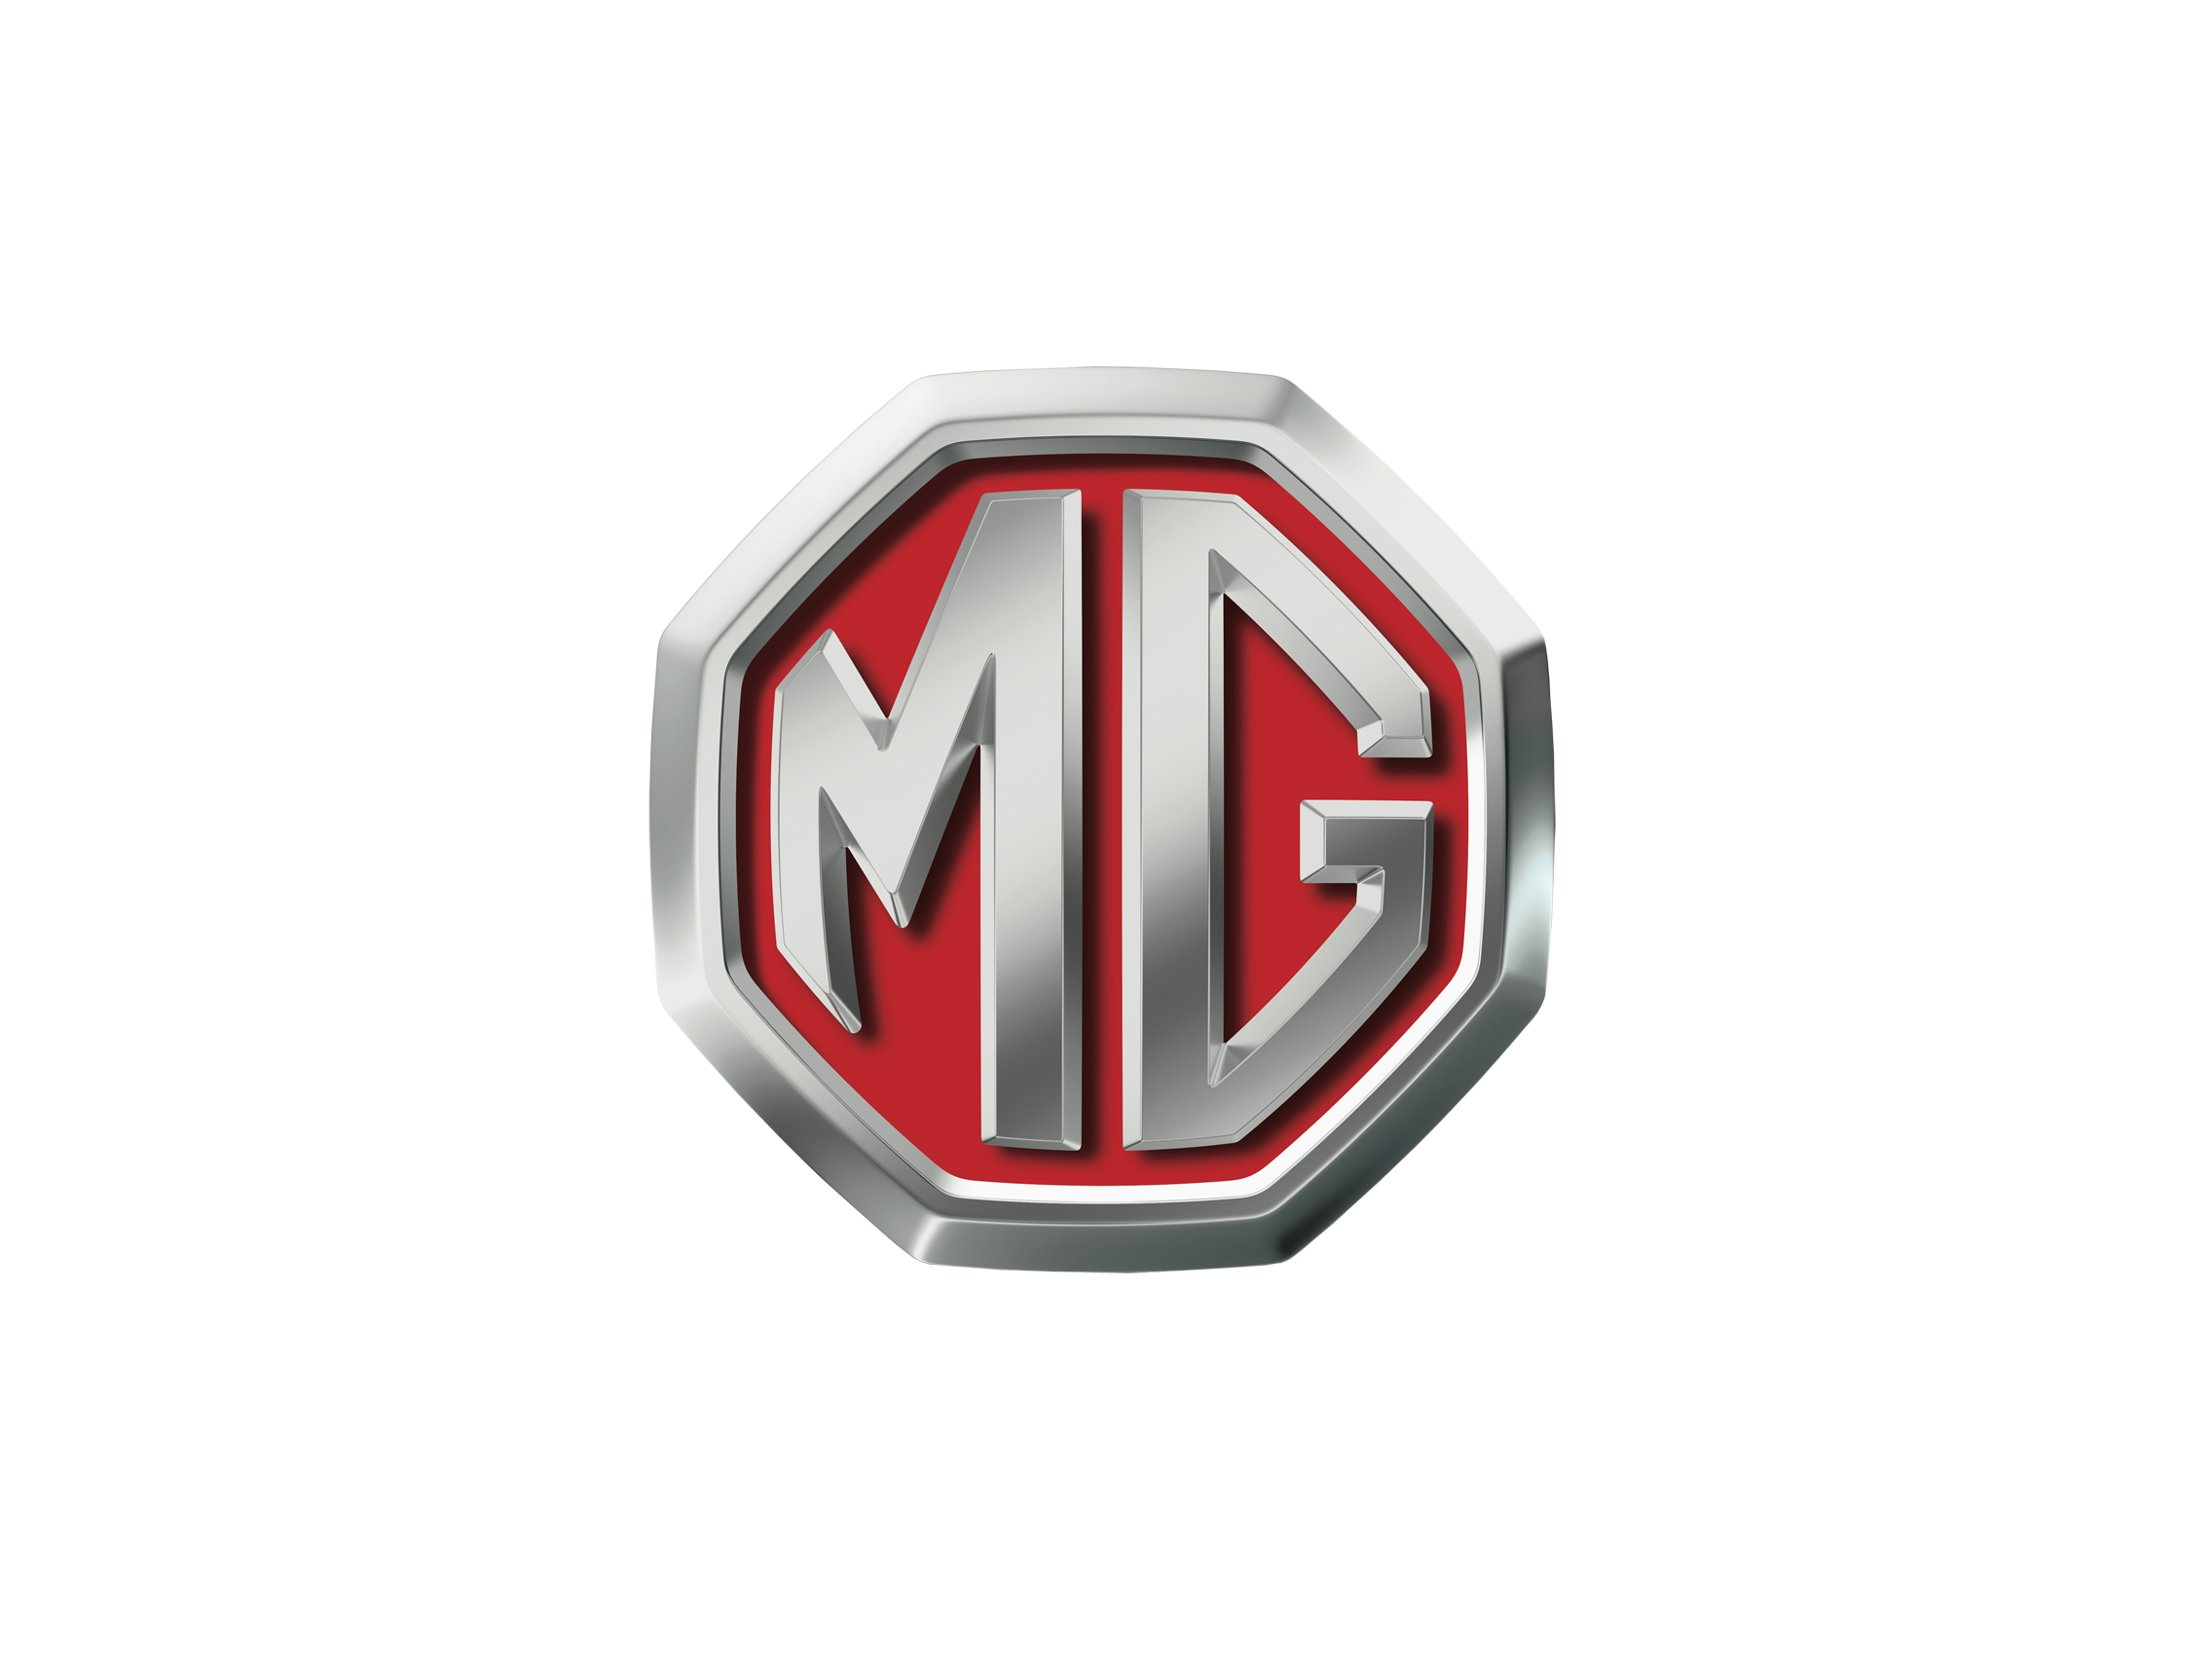 Mg Logo Hd Png Meaning Information Carlogos Org